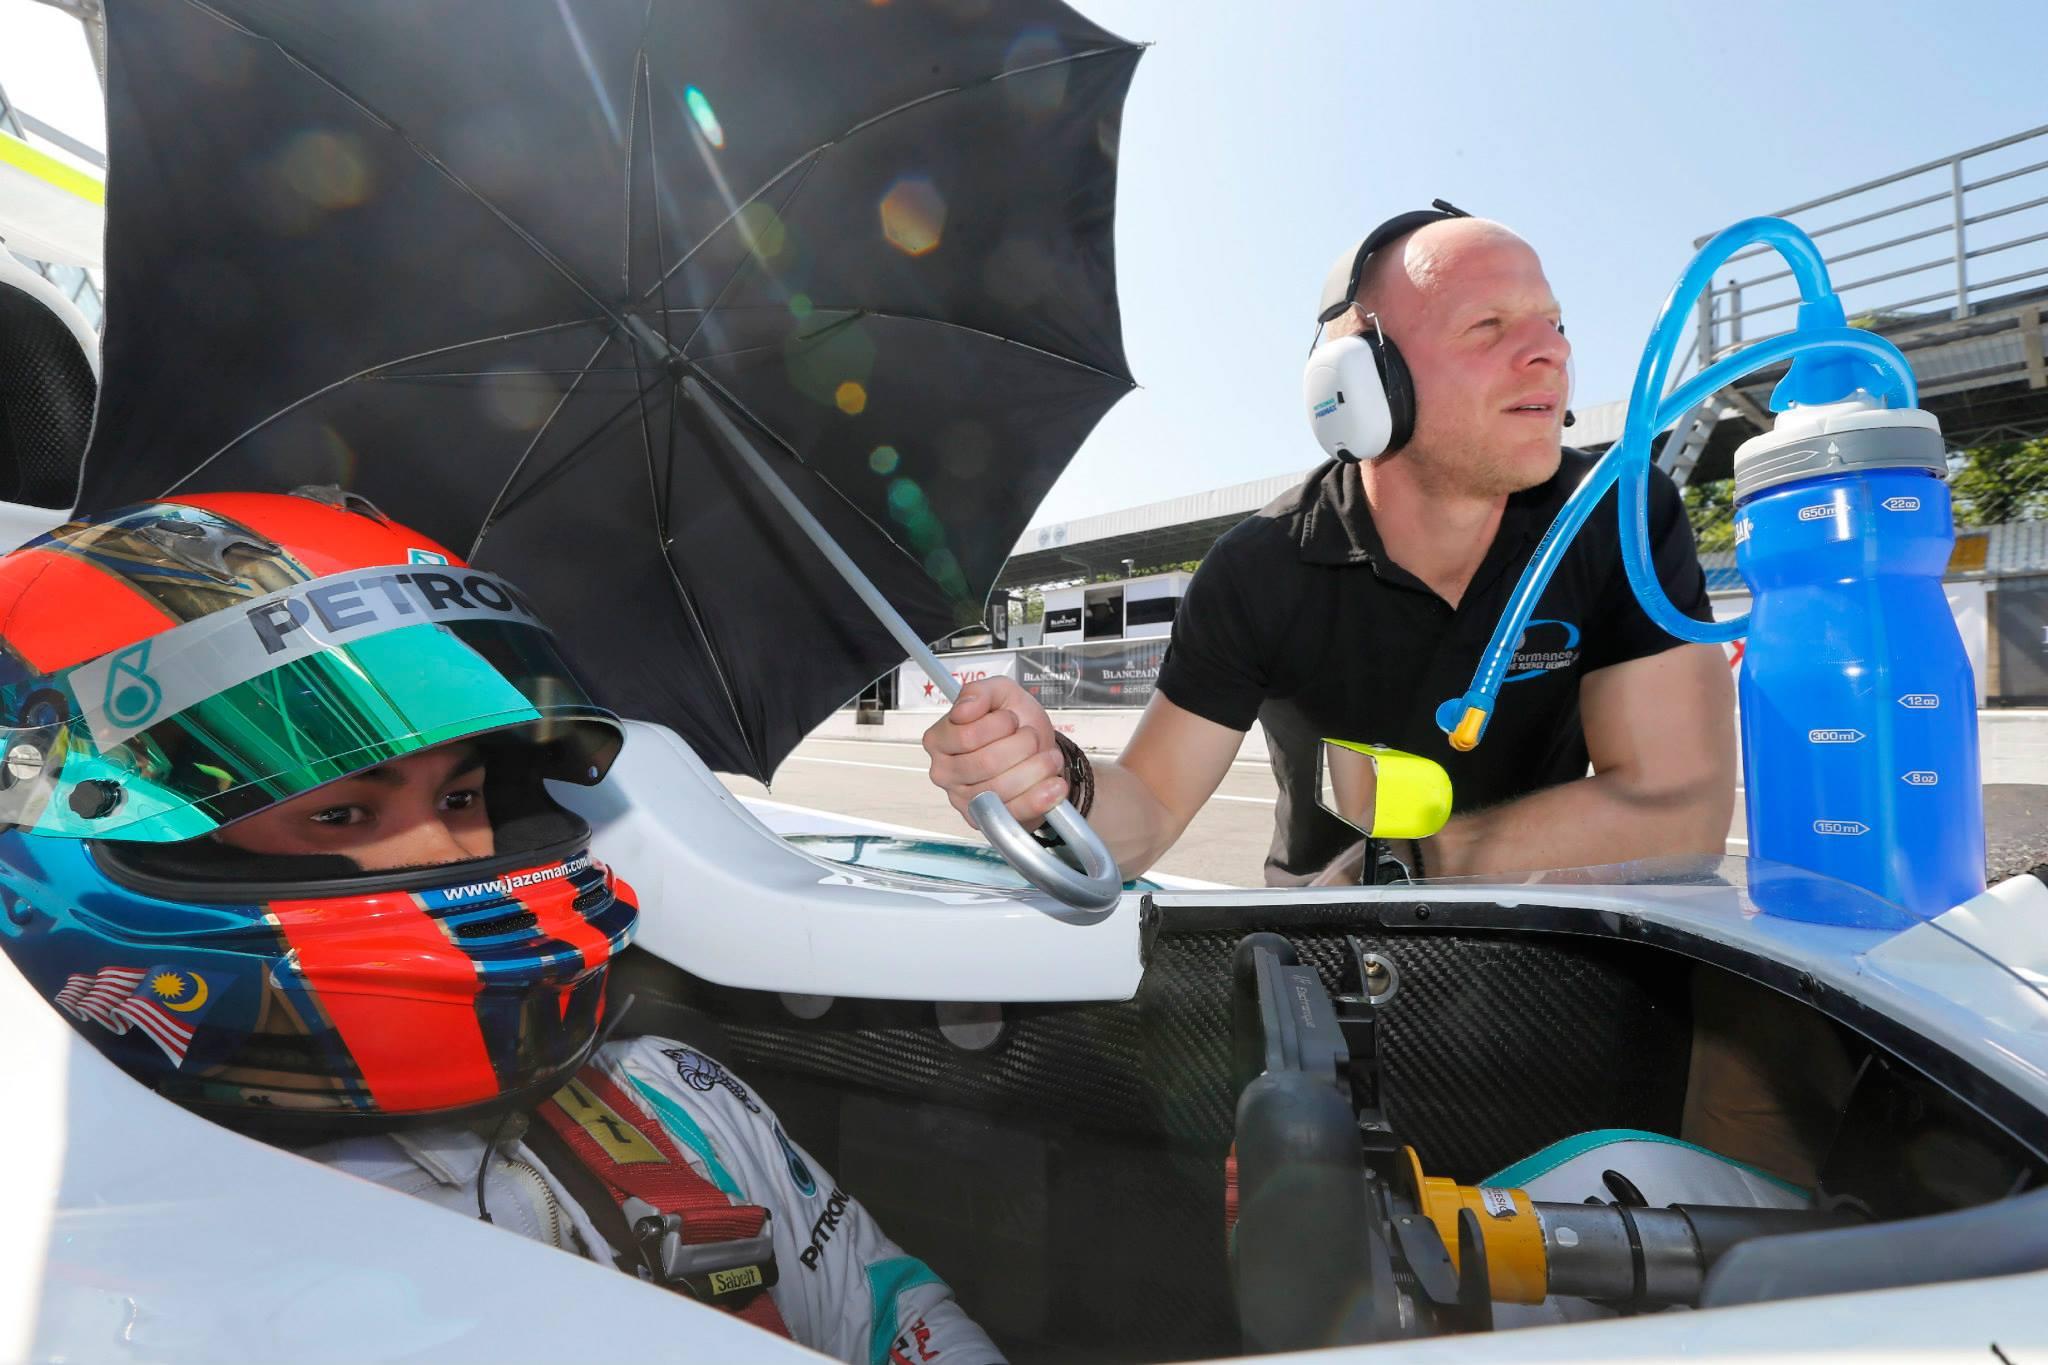 2014 Formula Renault 3.5 Series - Monza - Jazeman Jaafar